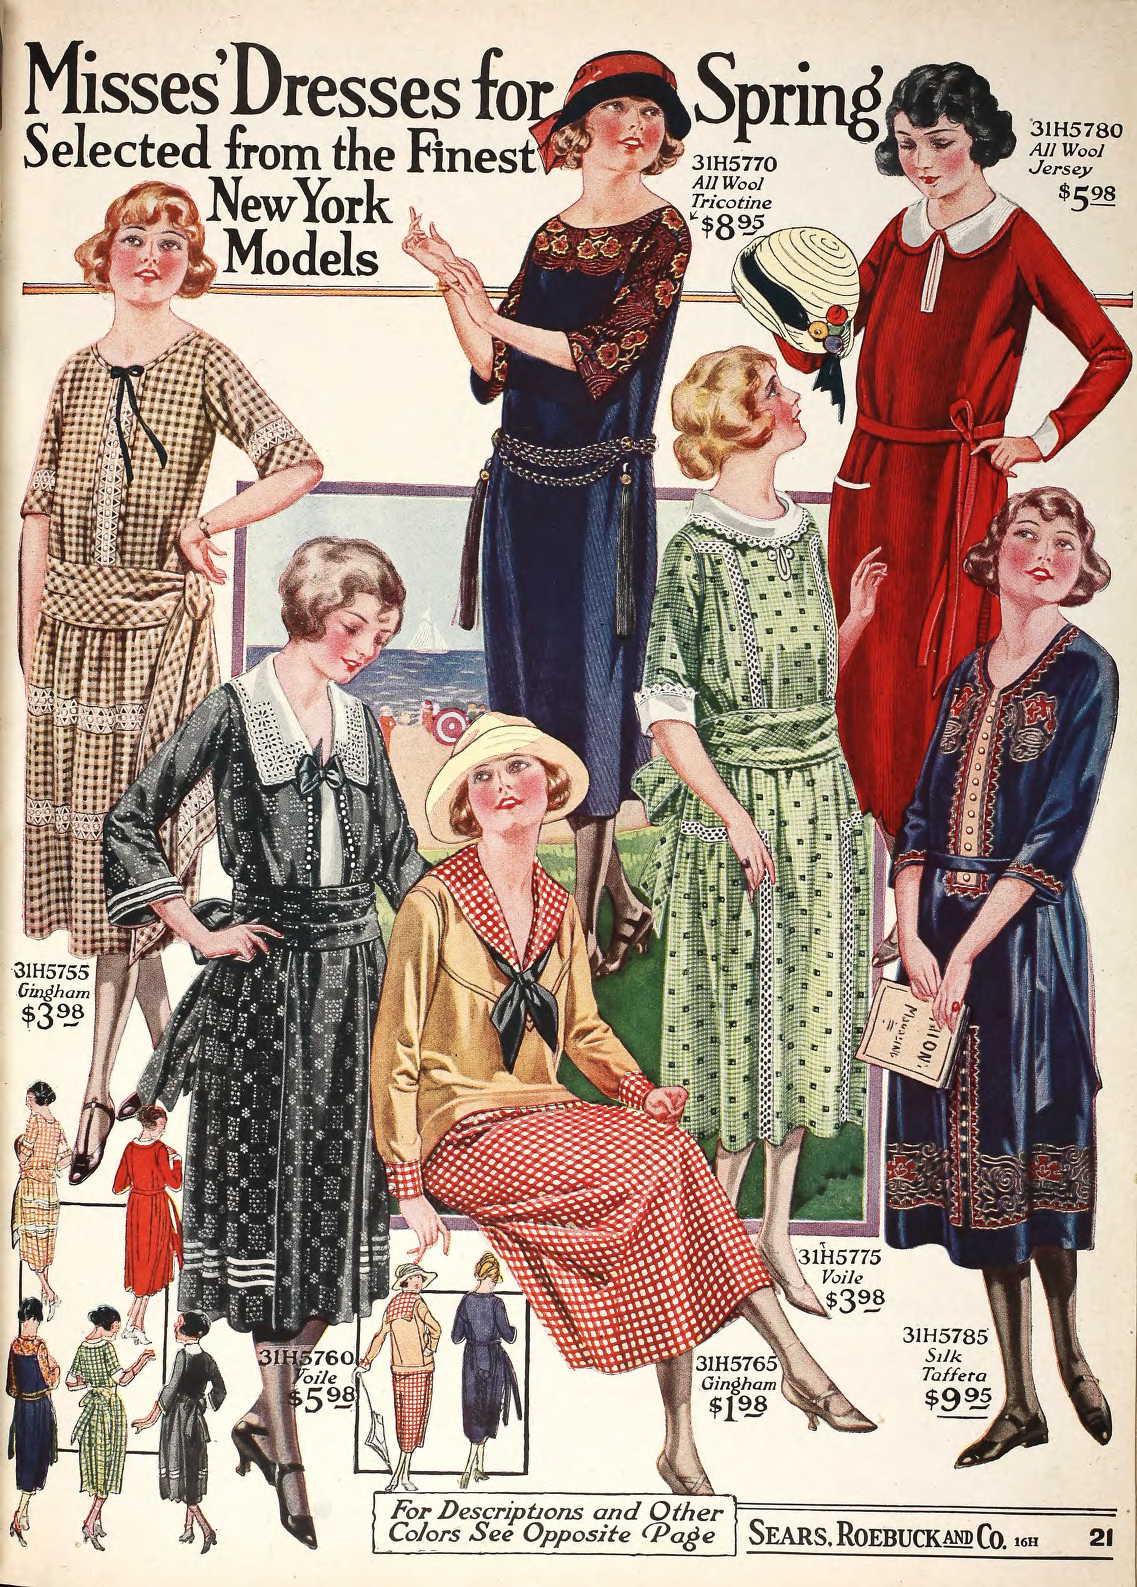 1920s Fashion Service Magazine June 1928 Bathing Suit: Snapped Garters: Sailor/Nautical Chic